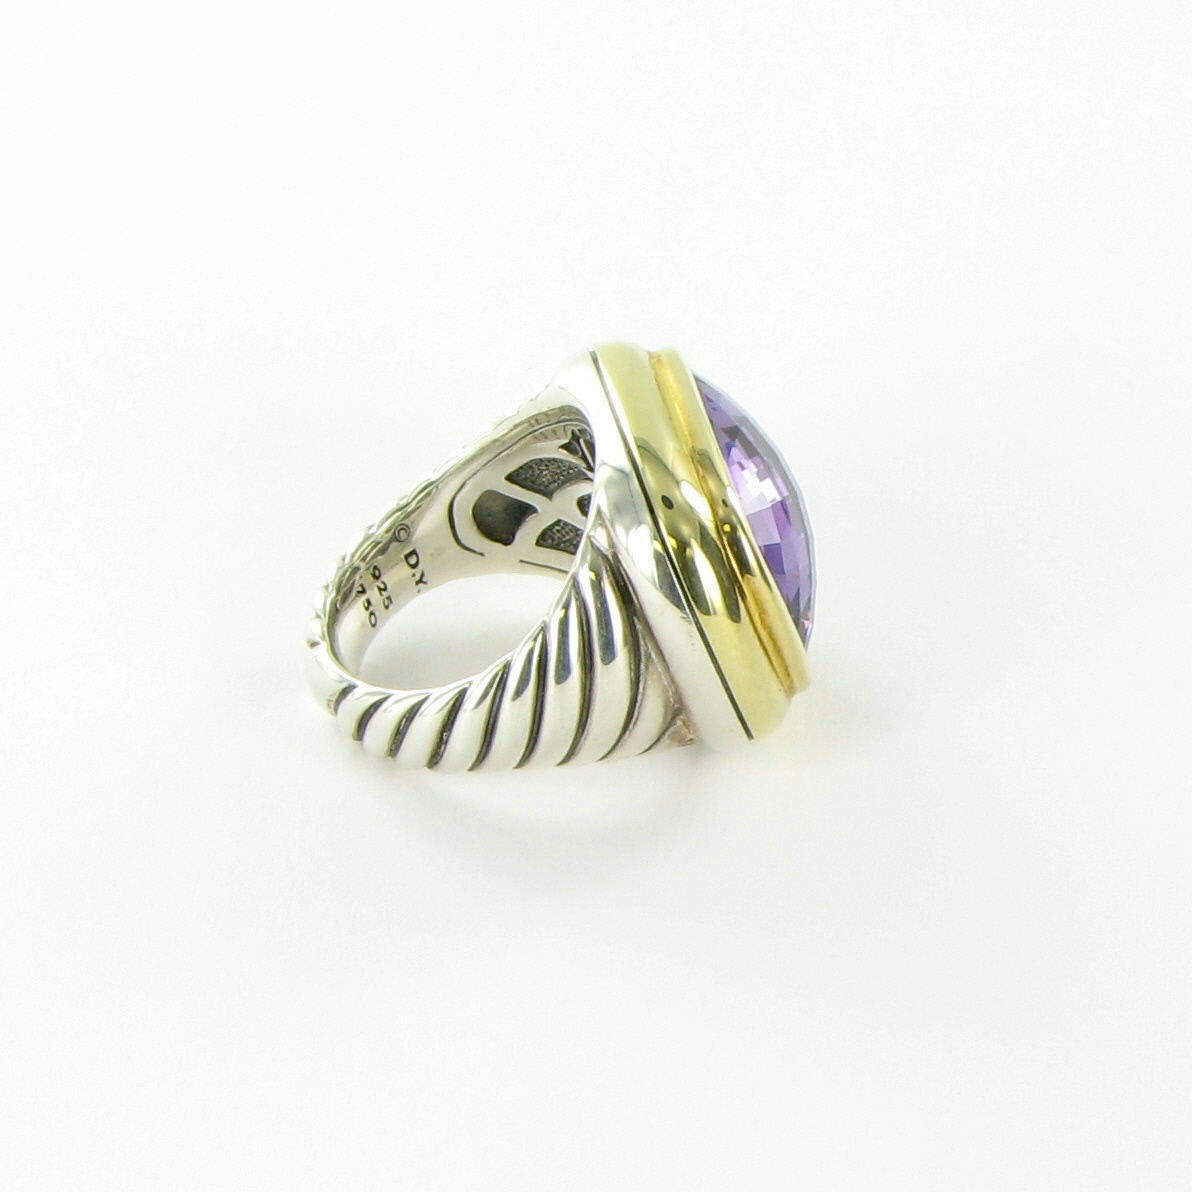 David Yurman Waverly Ring 18mm Amethyst 18K Yellow Gold Sterling Size 6 $1750